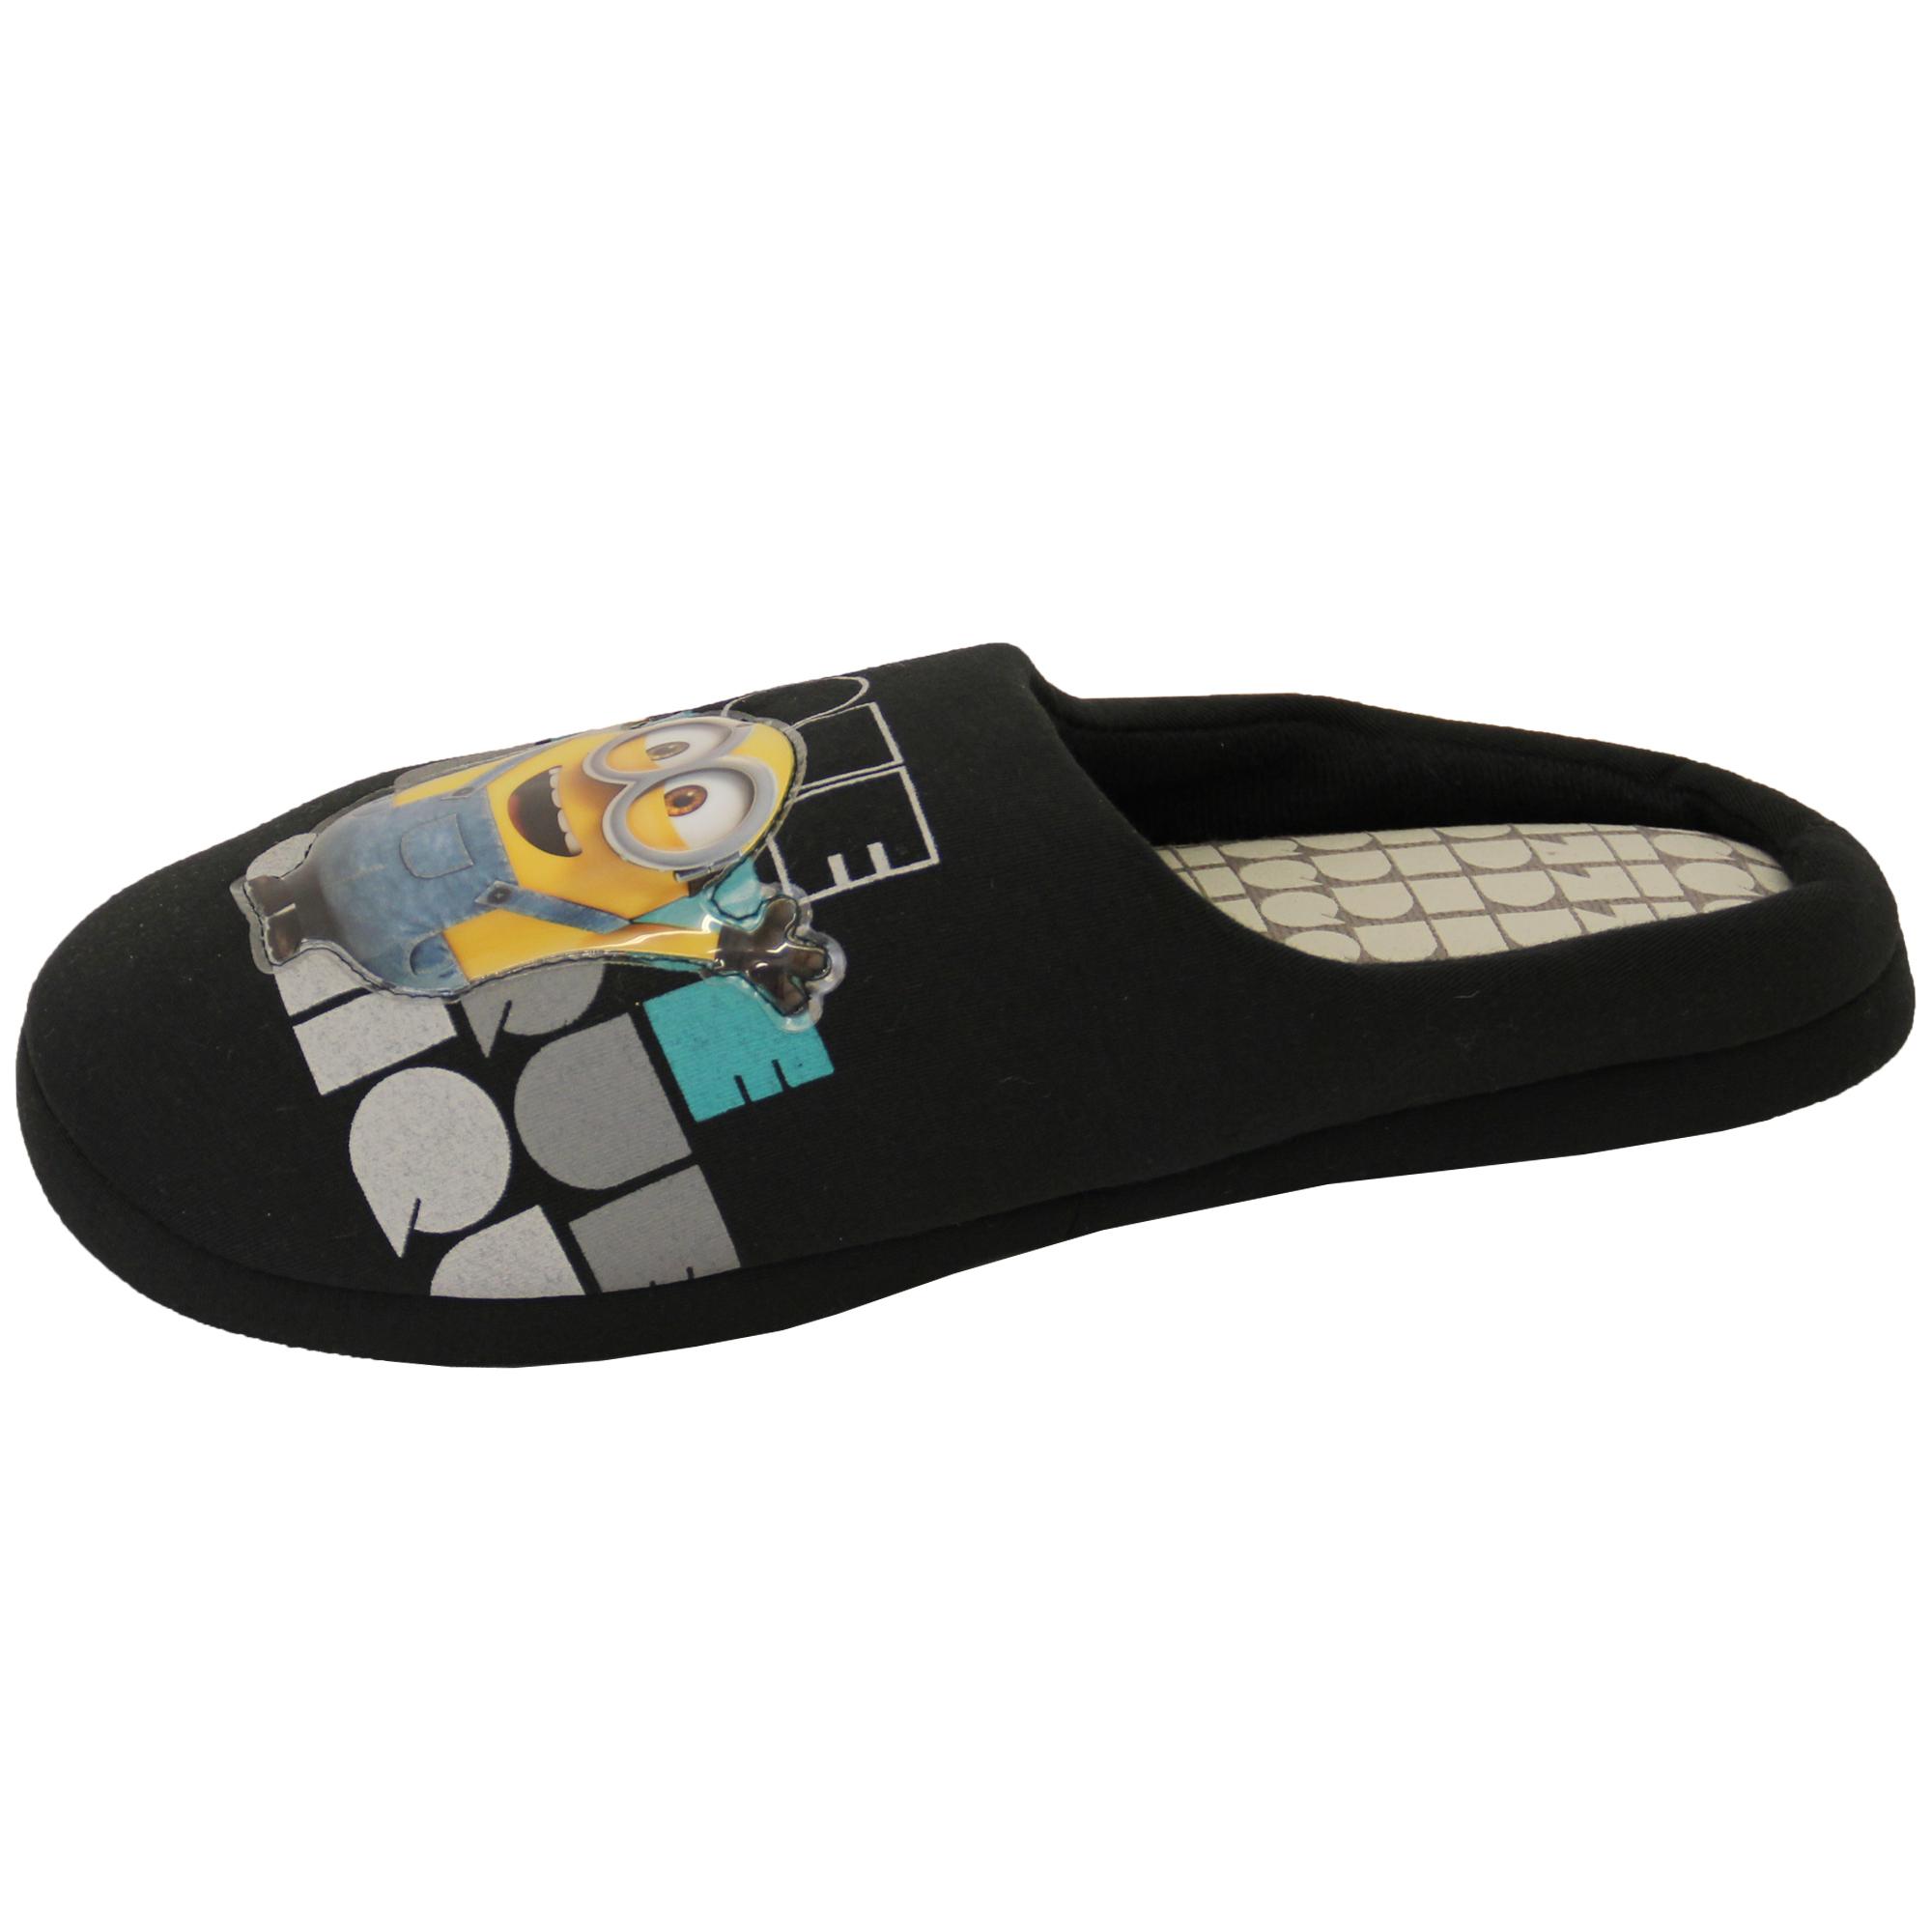 herren hausschuhe homer simpsons minions star wars pantoffeln sandalen ebay. Black Bedroom Furniture Sets. Home Design Ideas